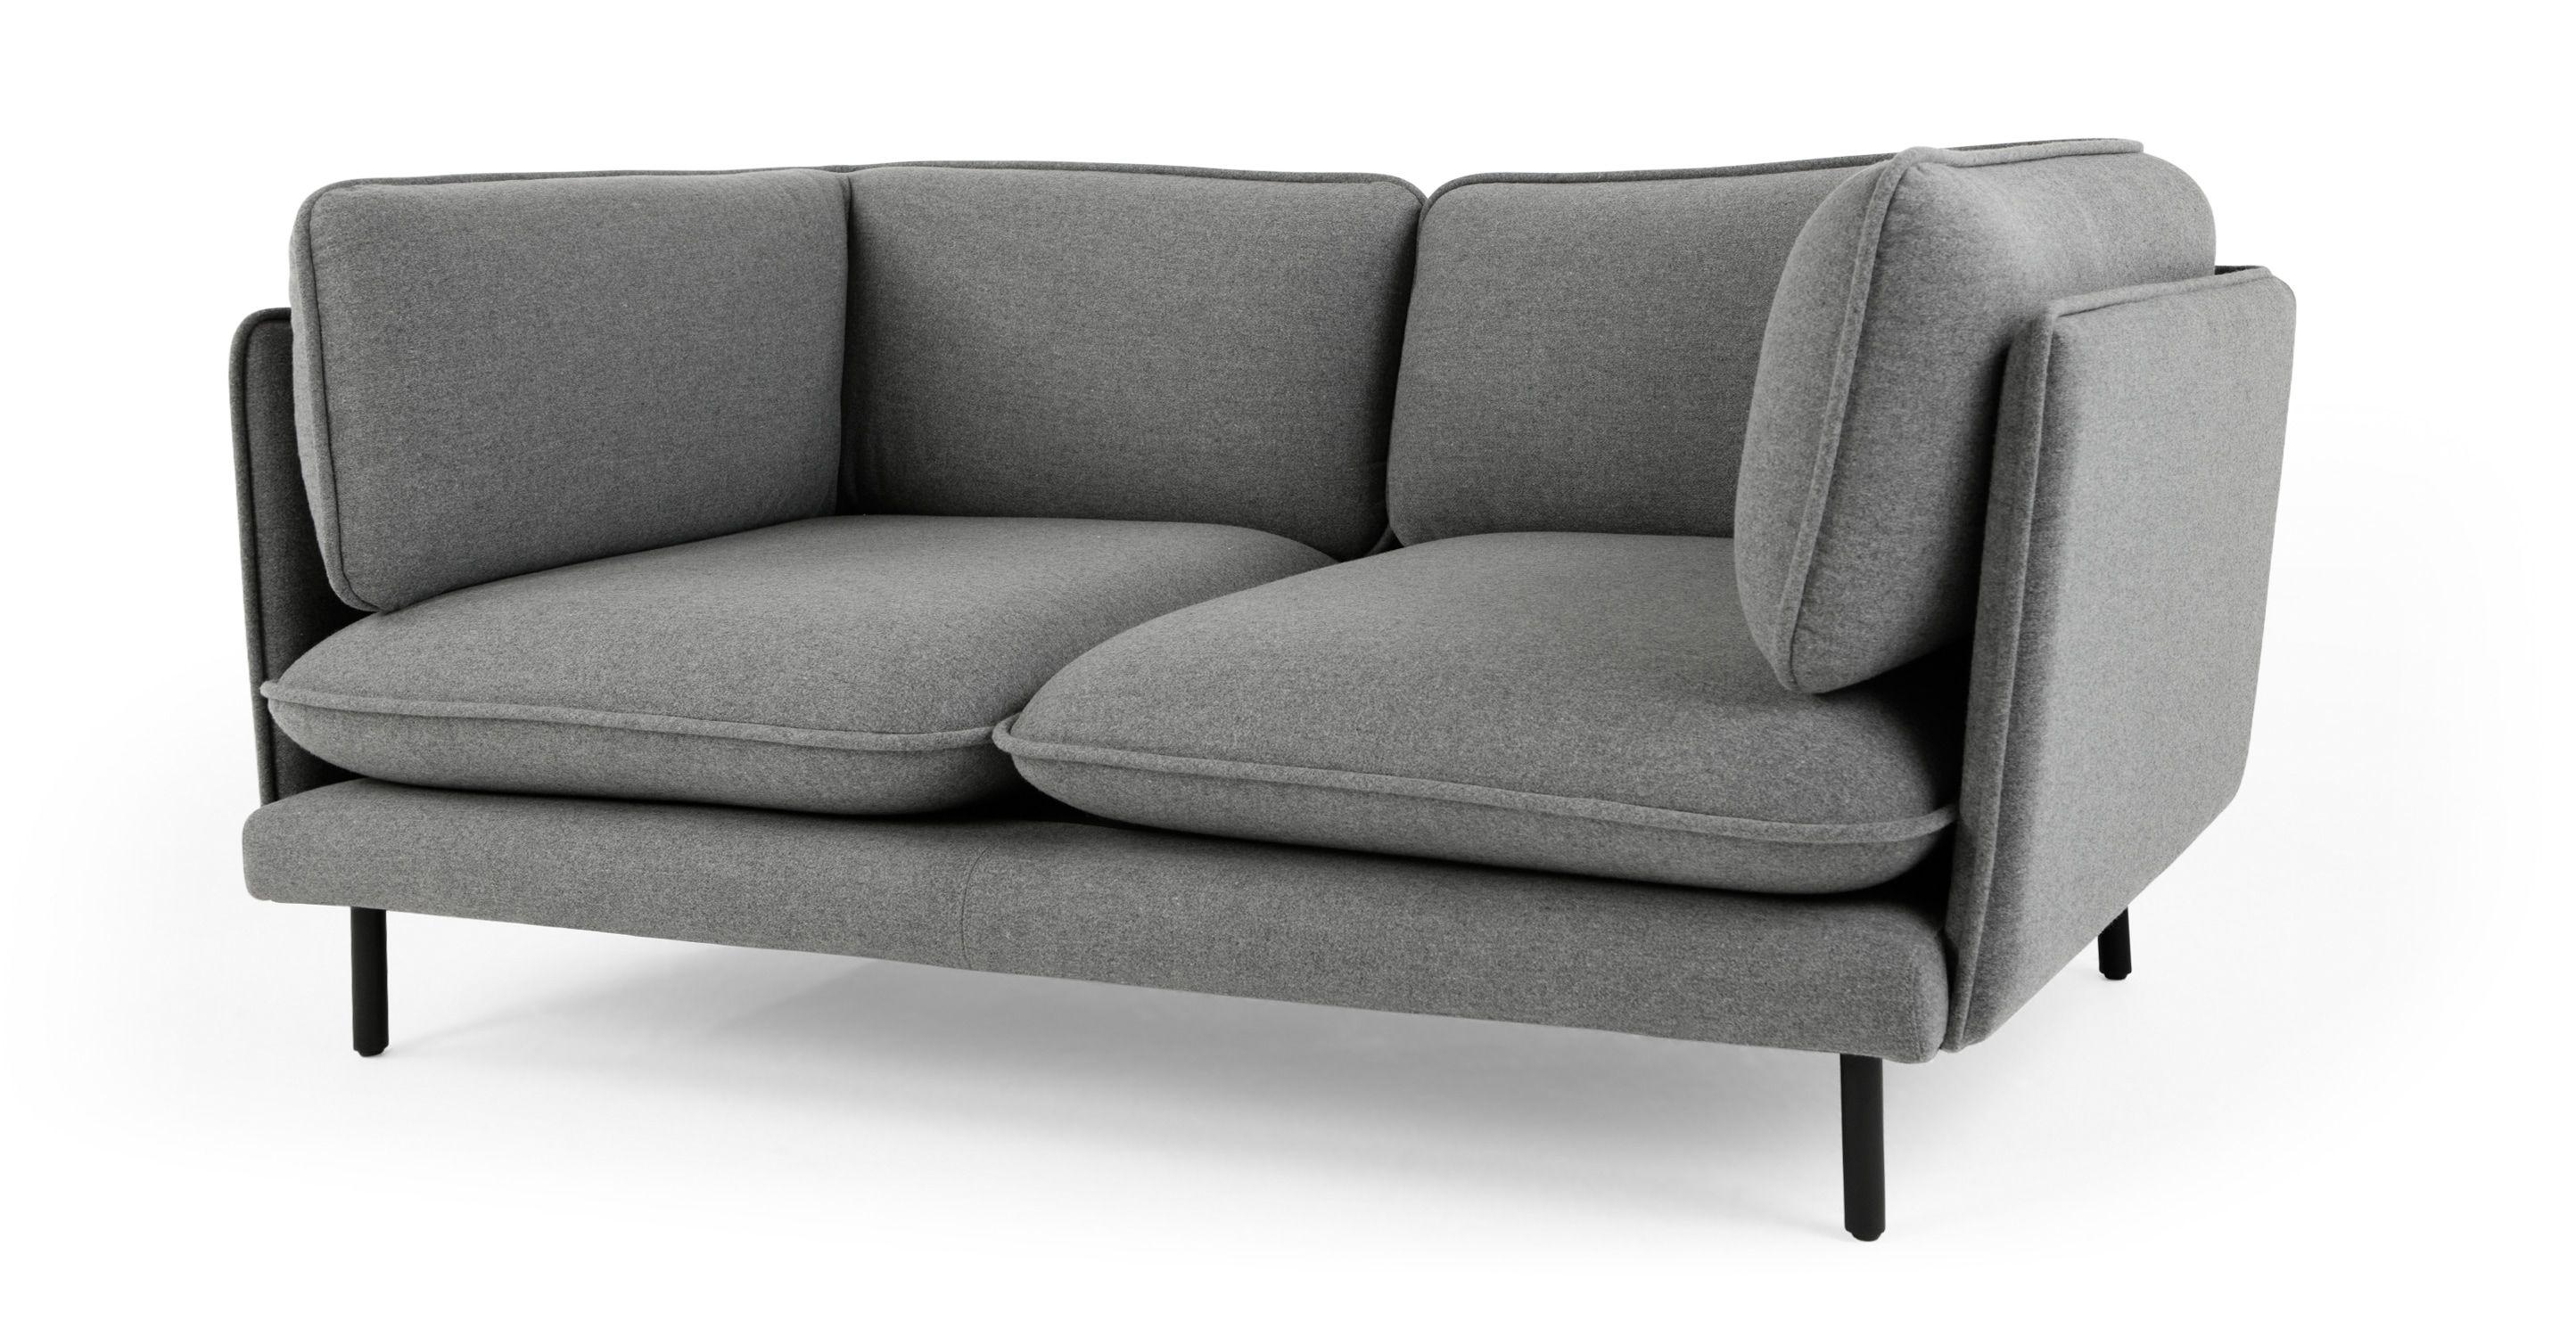 Wes 2 Sitzer Sofa, Signalgrau